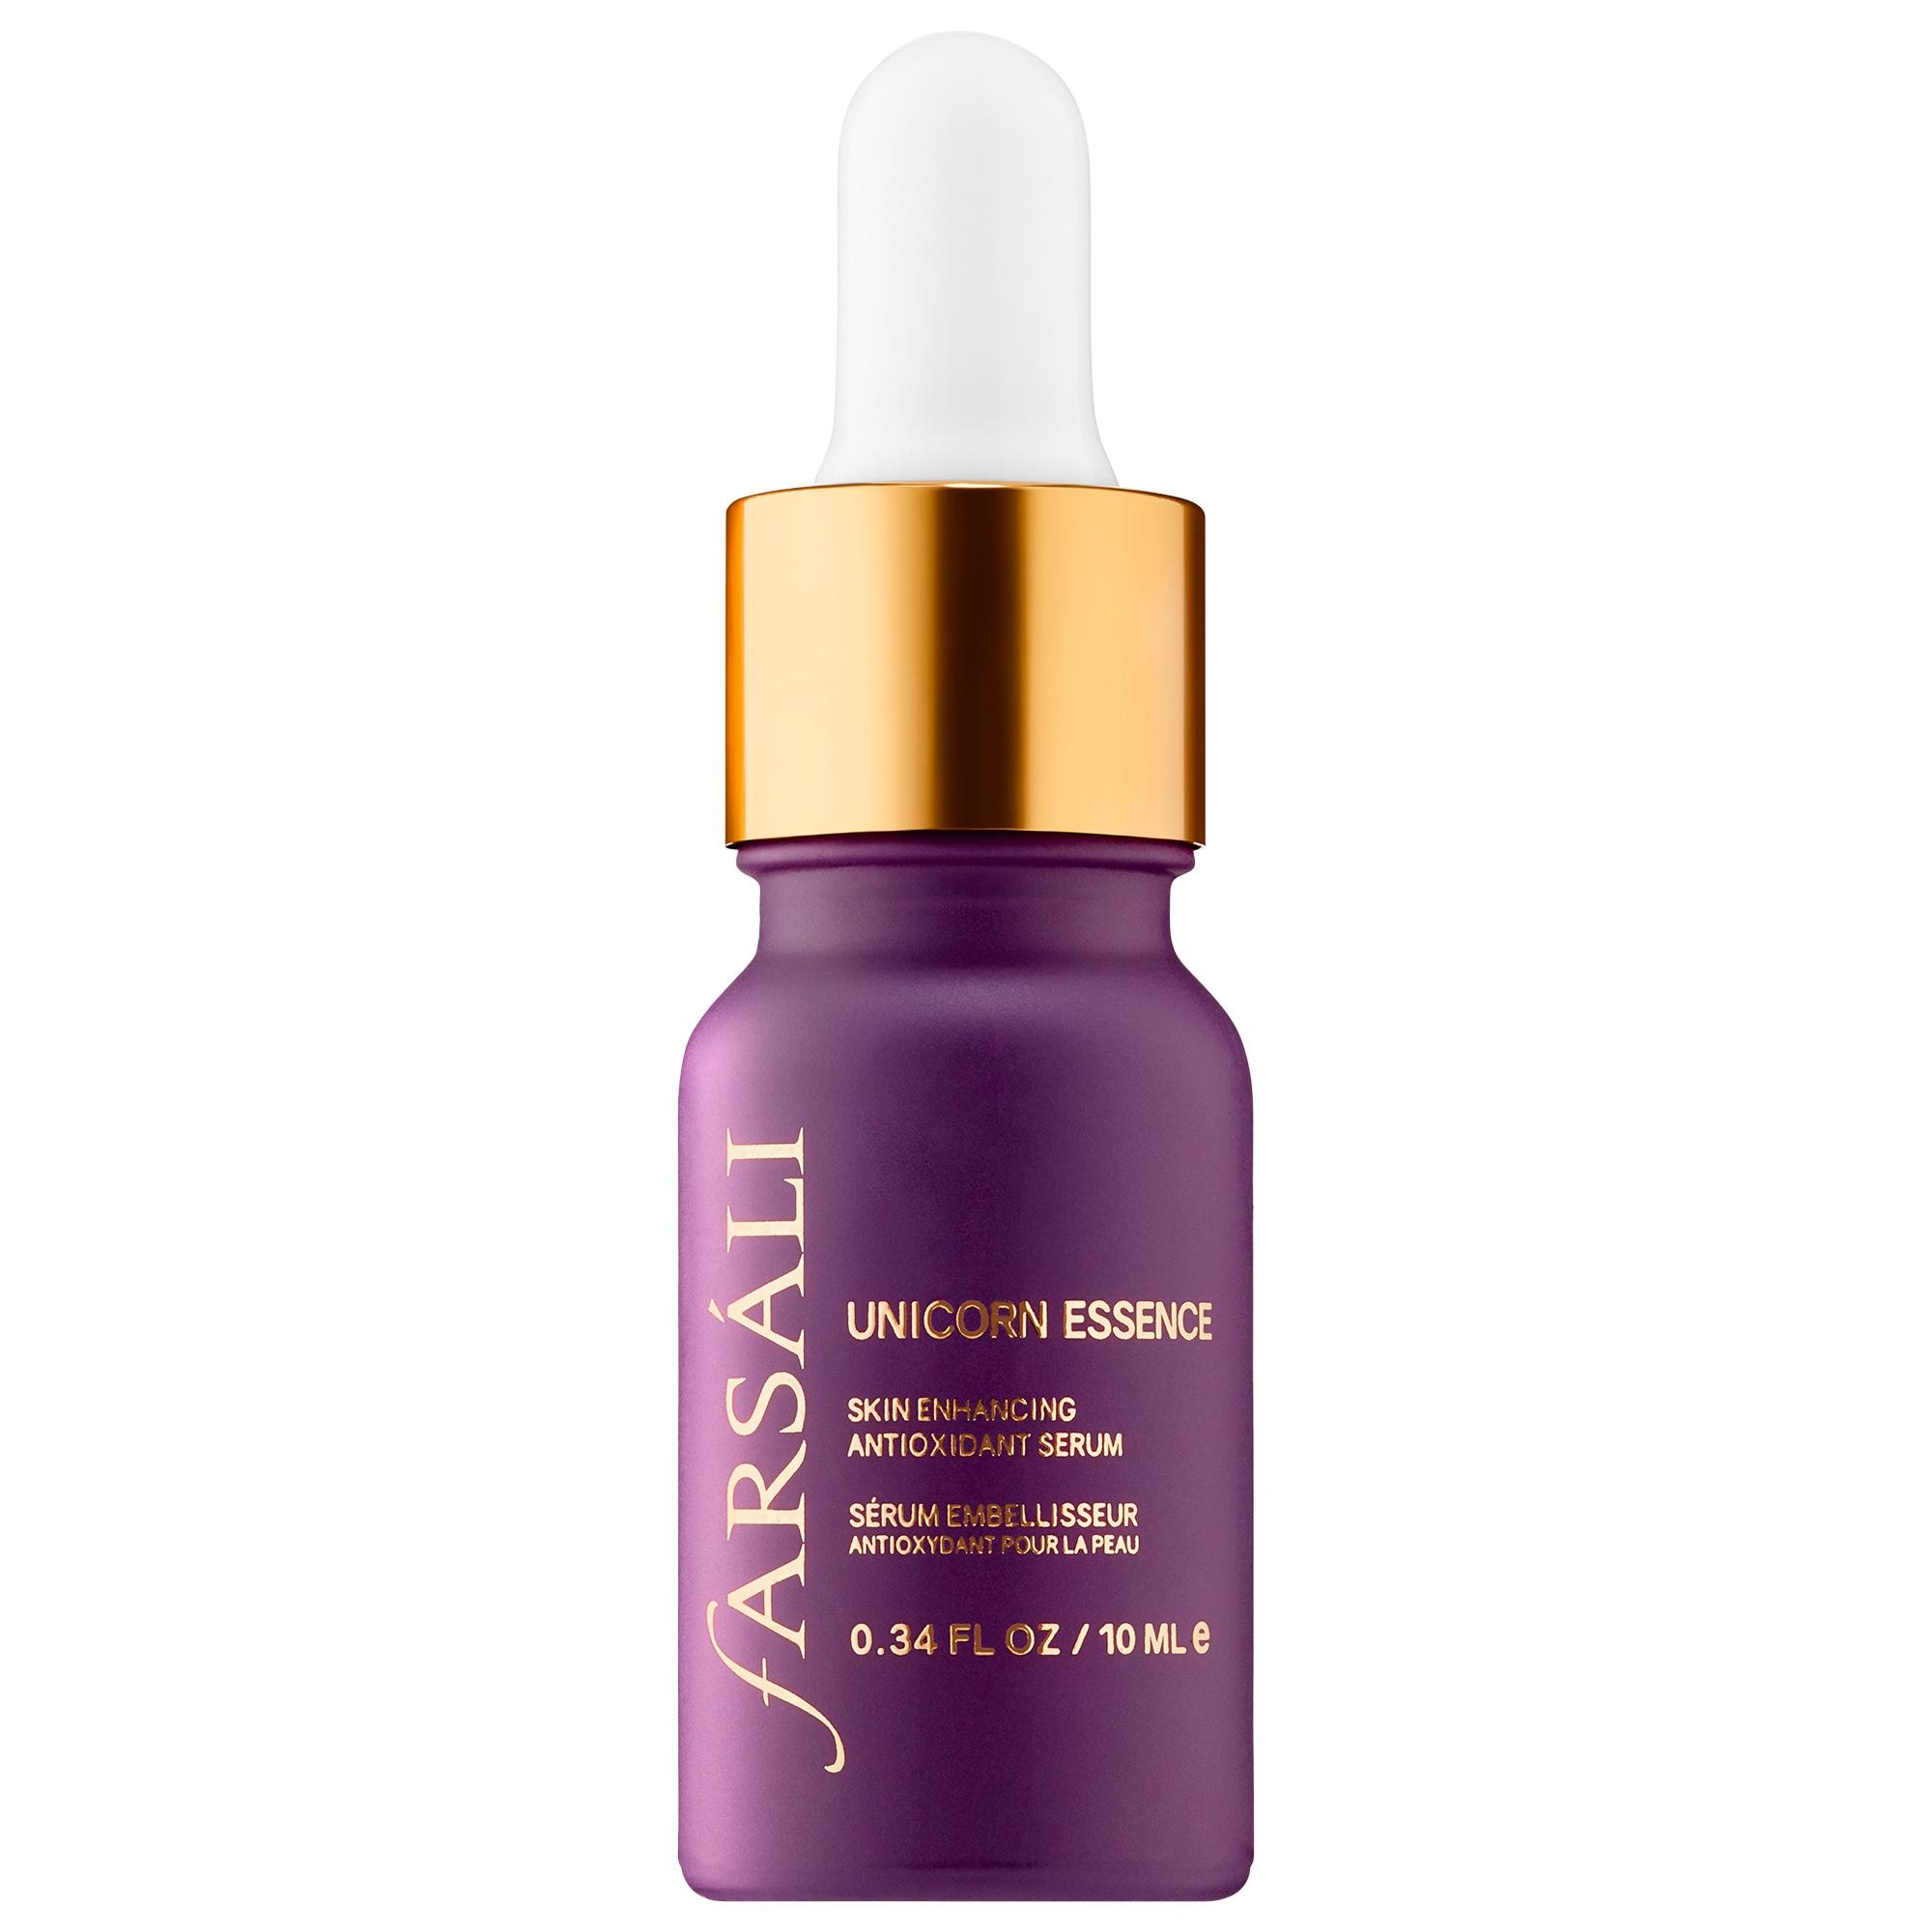 Sephora - Unicorn Essence Antioxidant Primer Serum - FARSÁLI | Sephora